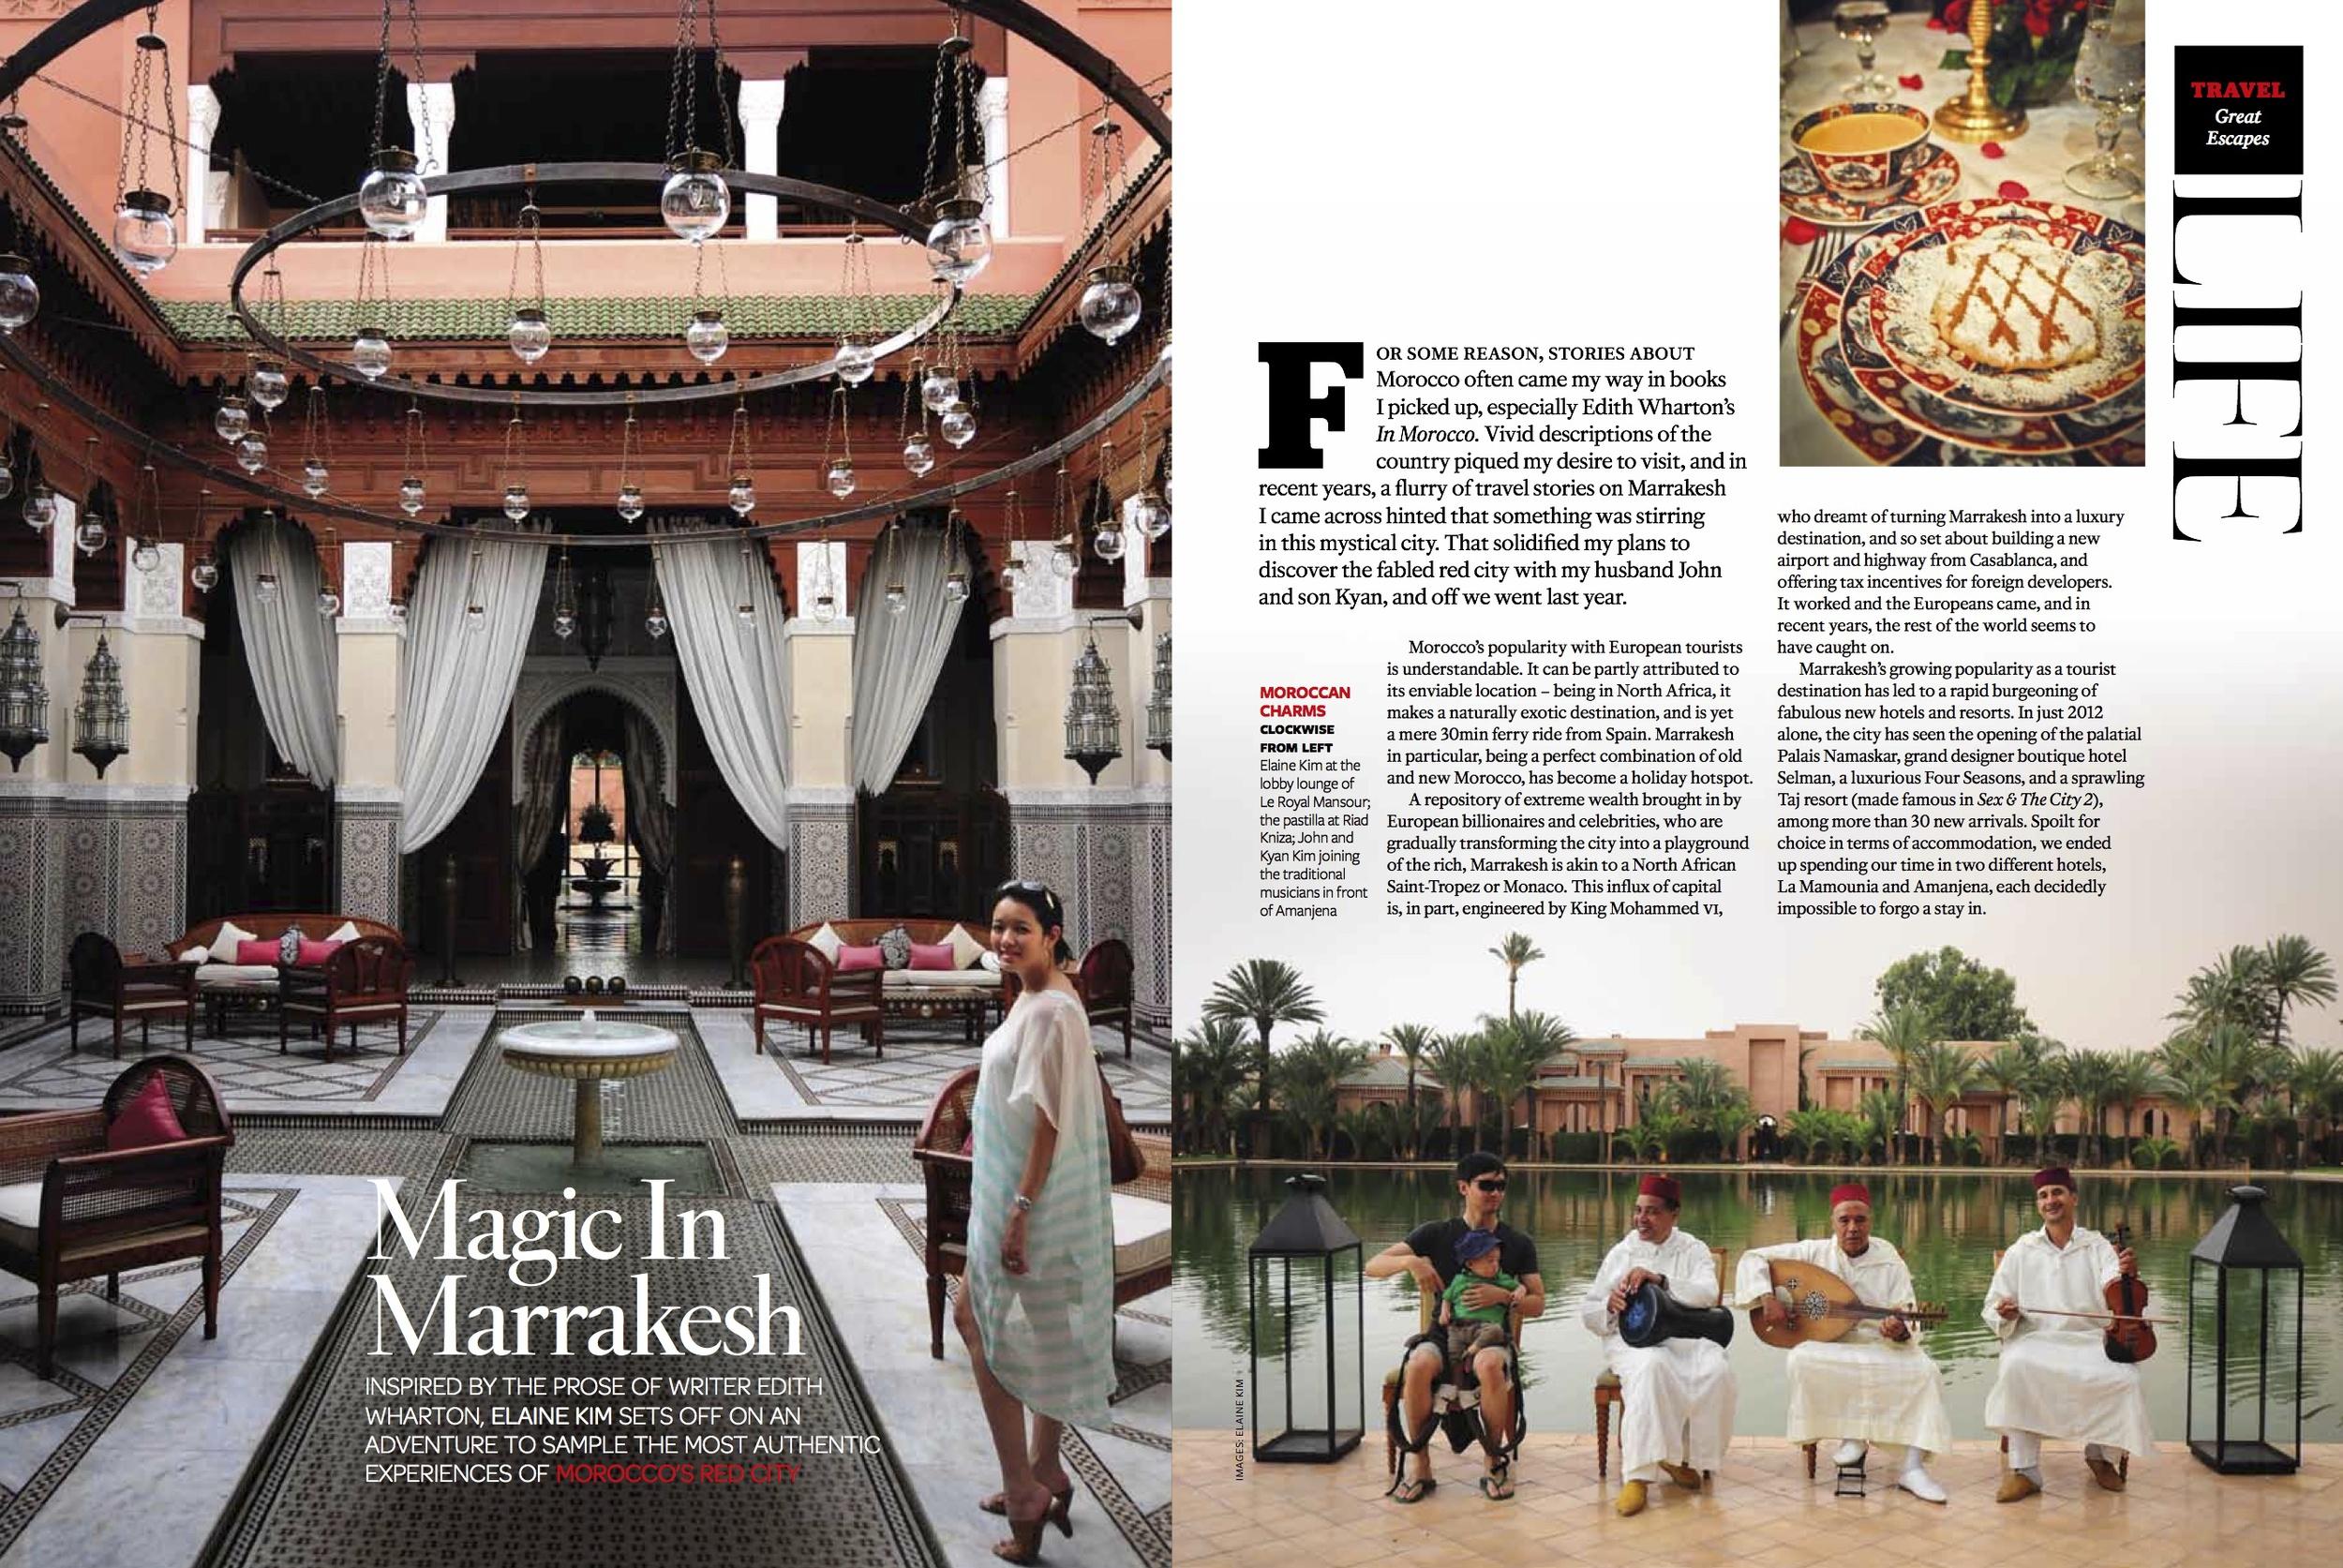 Magic in Marrakesh, Tatler Aug 2013 [ Morocco ]